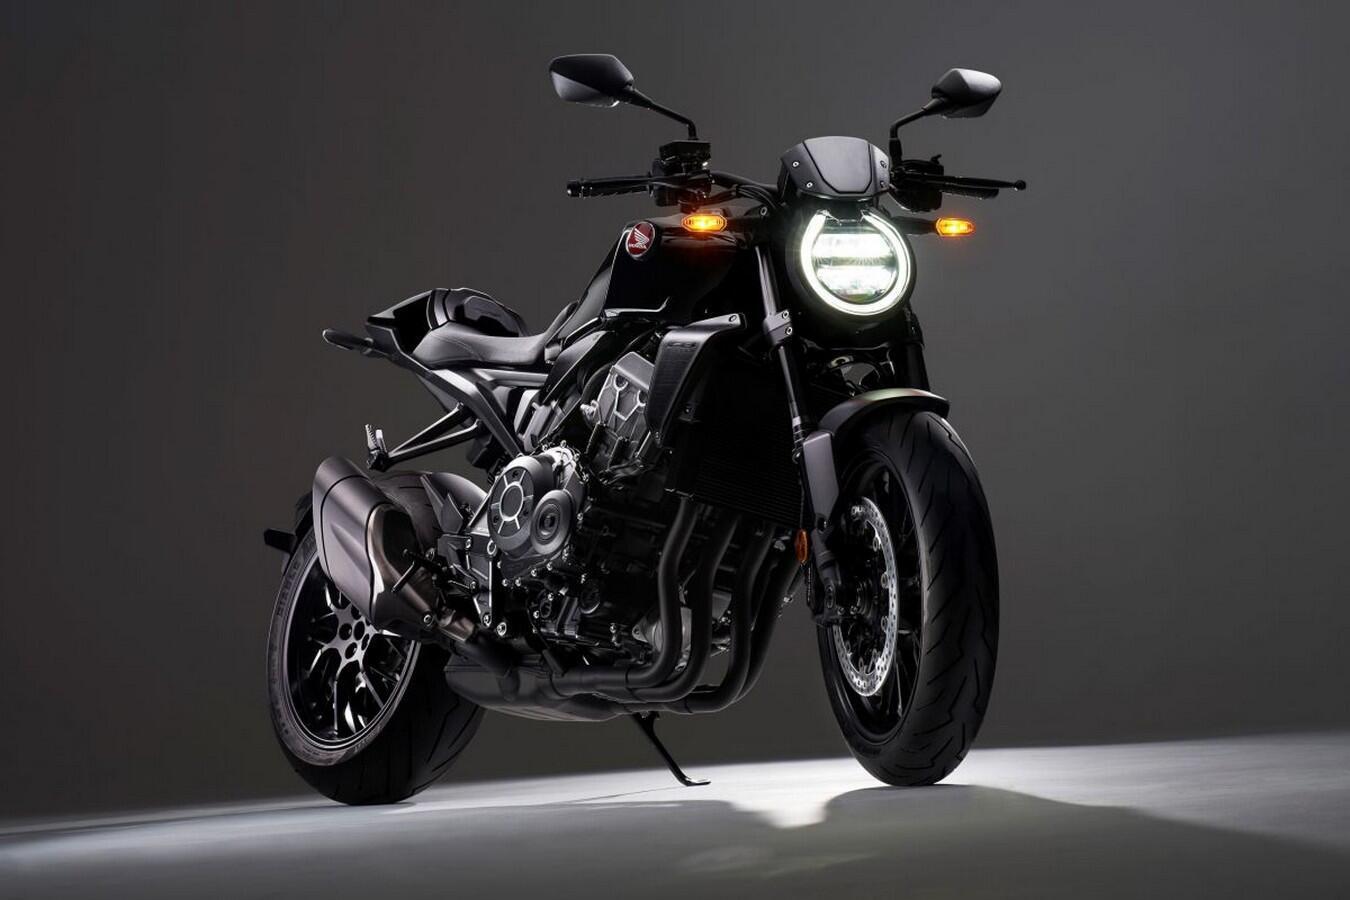 honda-cb1000r-2021-phien-ban-black-edition-trinh-lang